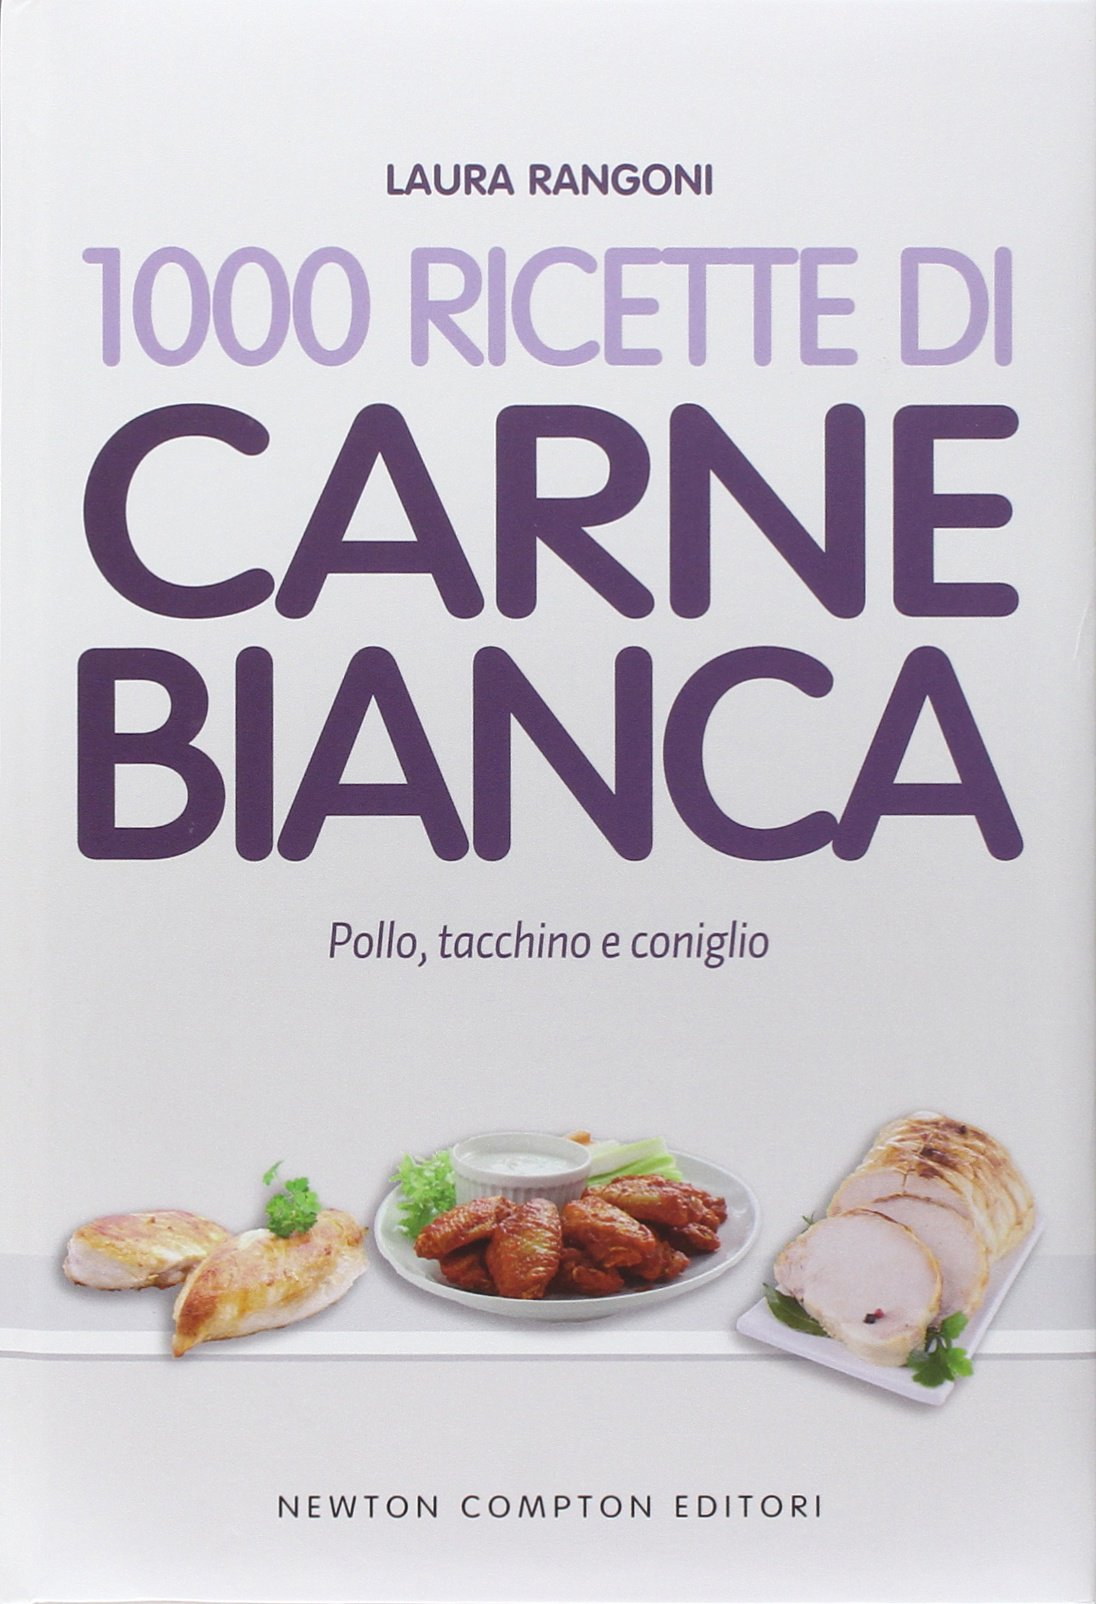 1000 ricette di carne bianca Copertina rigida – 11 set 2014 Laura Rangoni Newton Compton 8854170844 Cucina